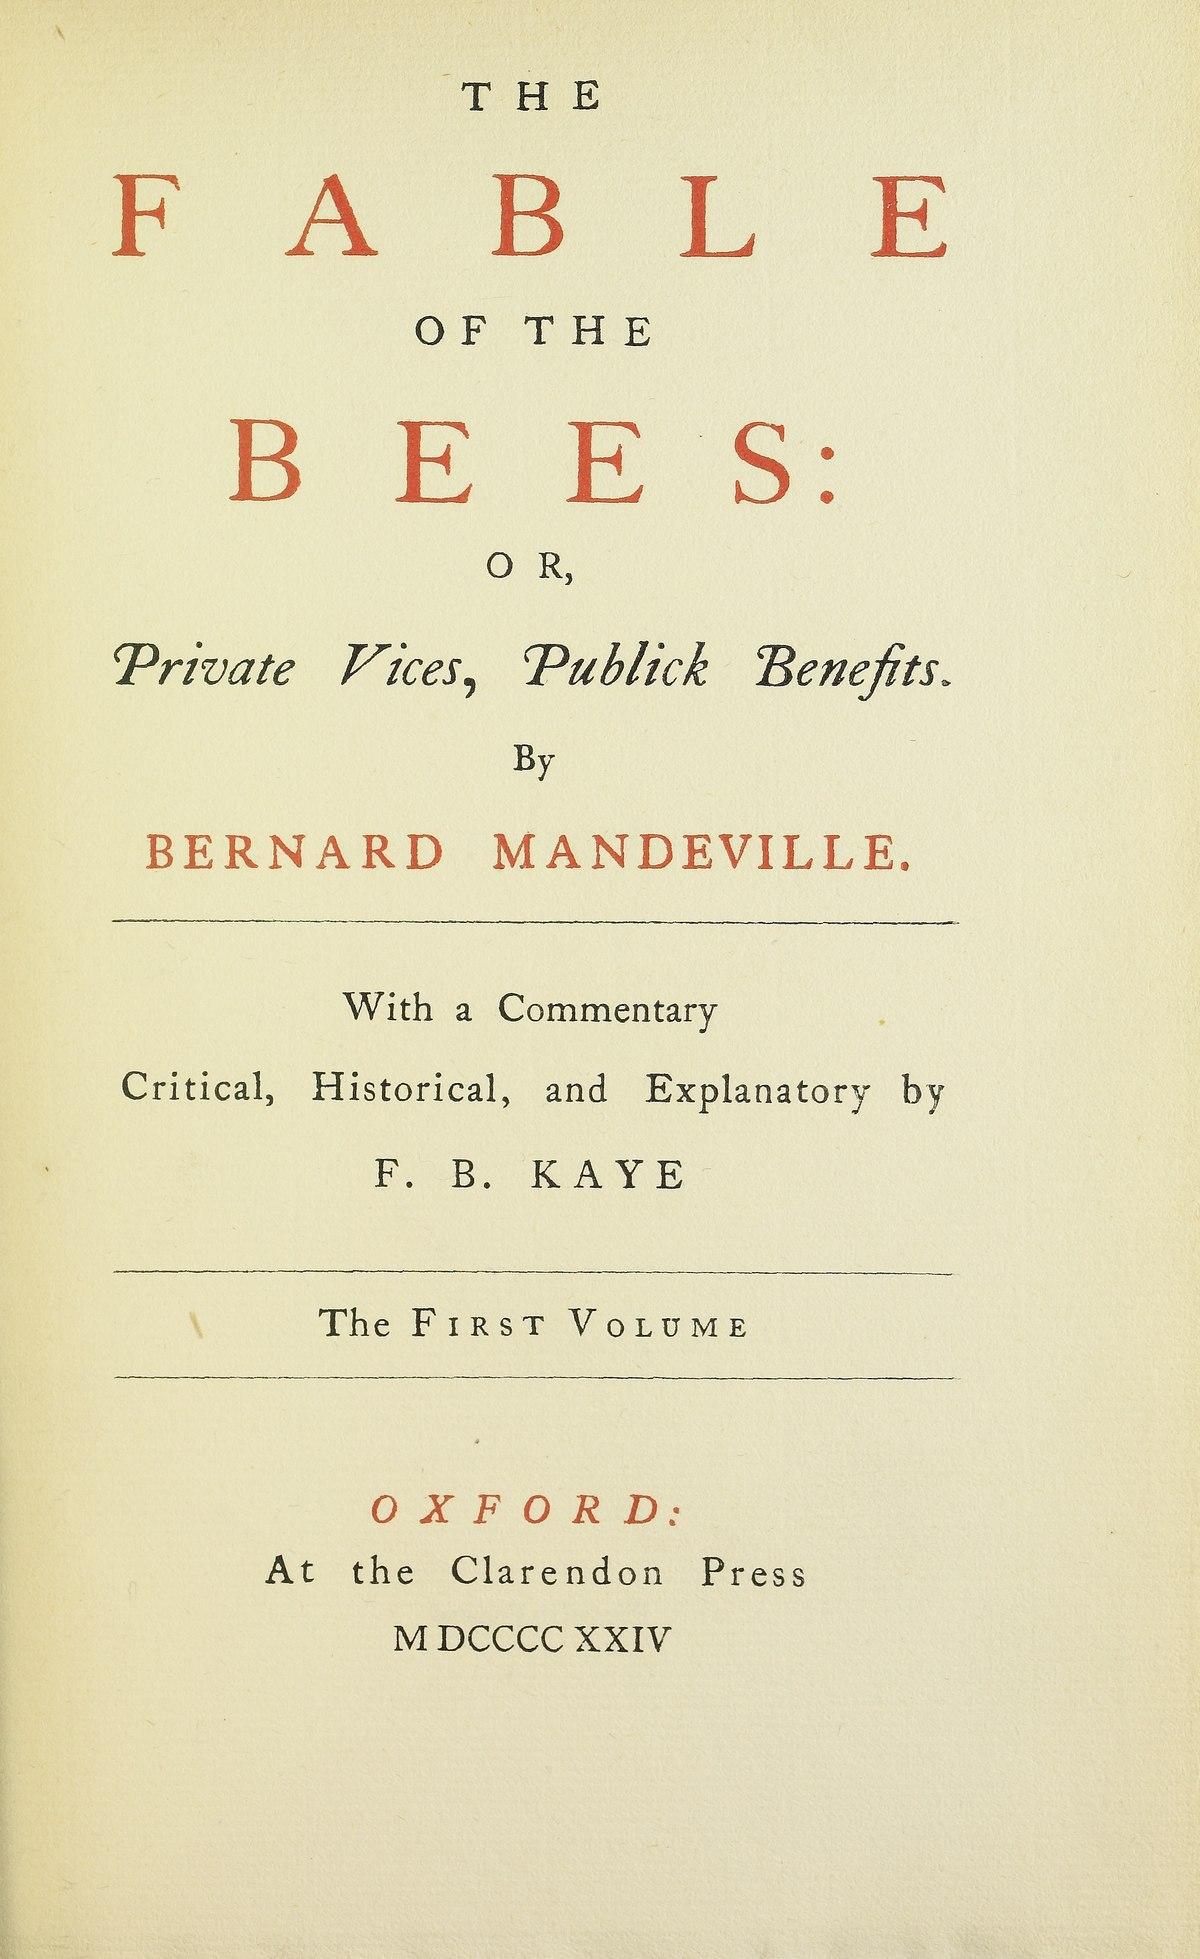 bernard mandeville wikipedia